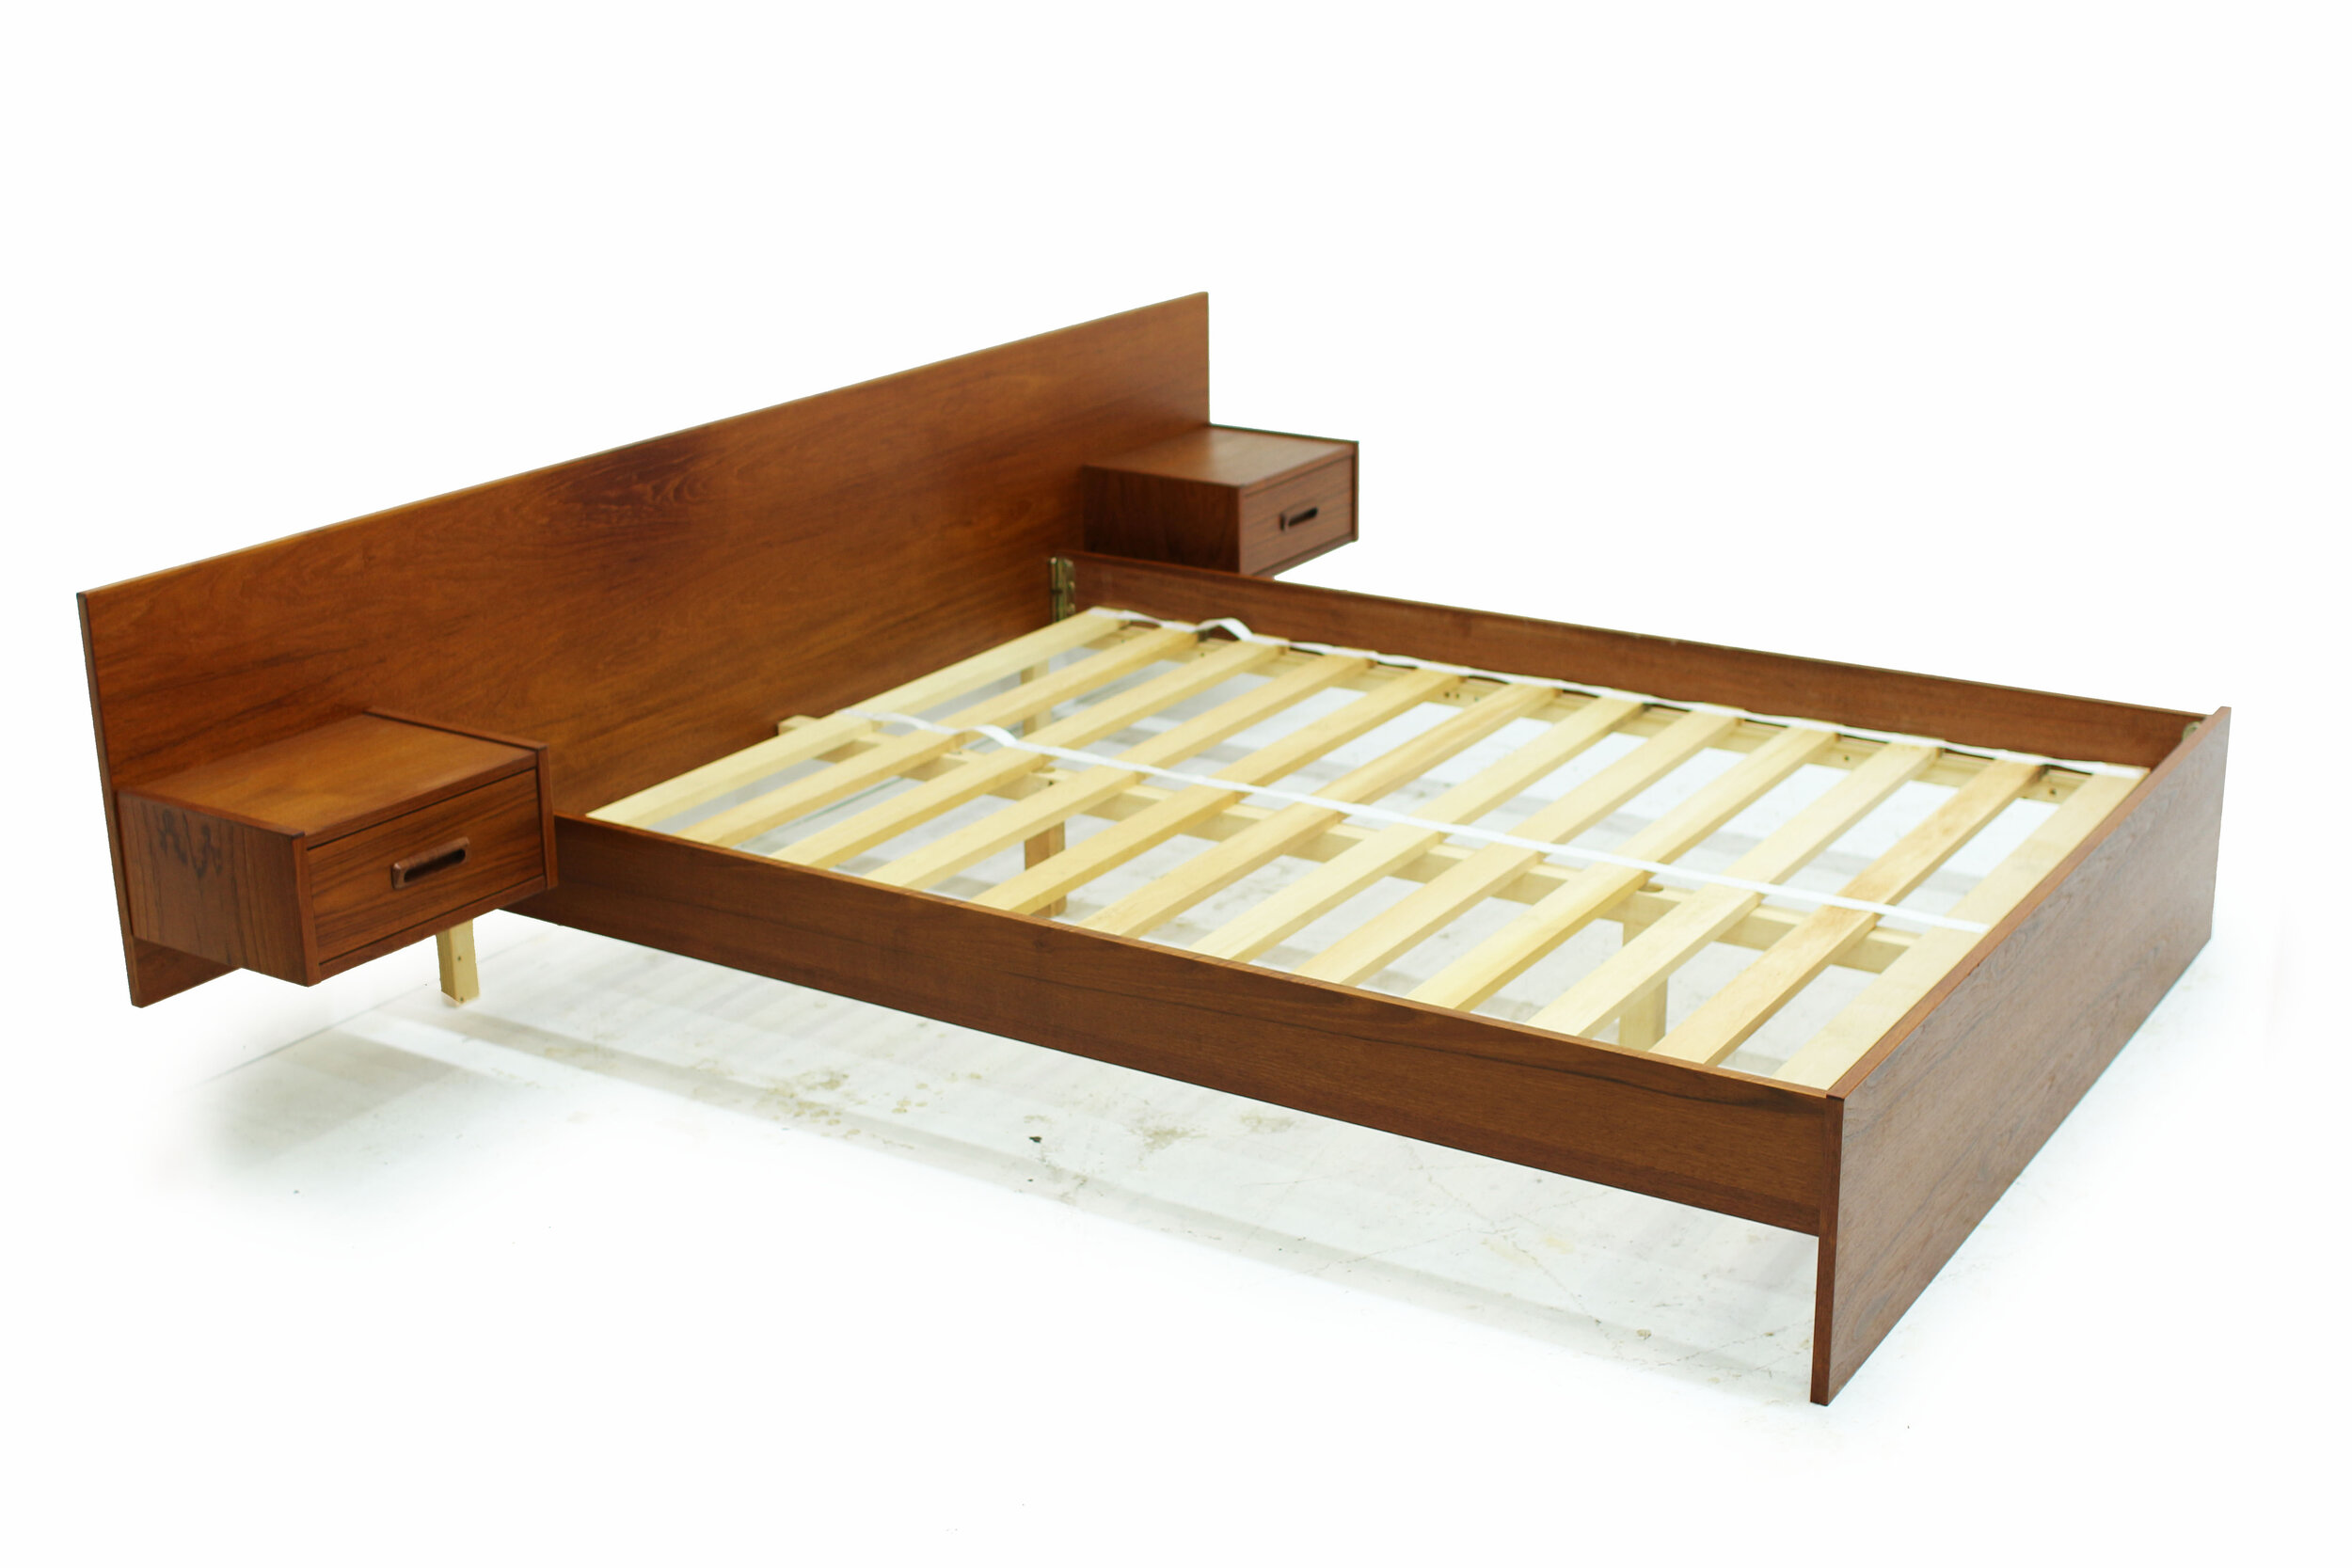 Mid Century Teak Double Platform Bed with Attached Nightstands (3).jpg